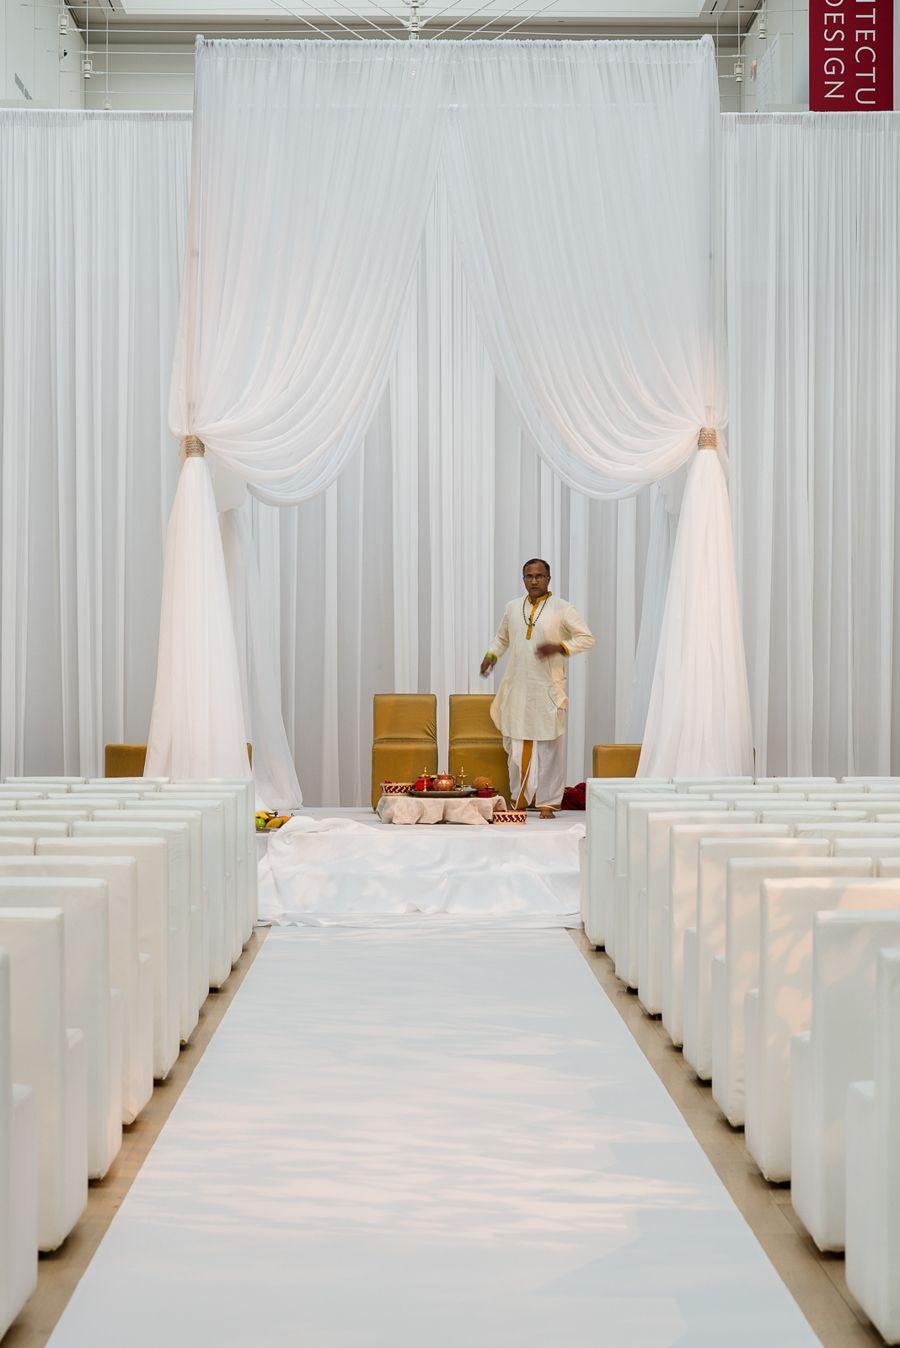 Decoration images for wedding  Modern Wedding Decor  Chicago Weddings and Wedding pics